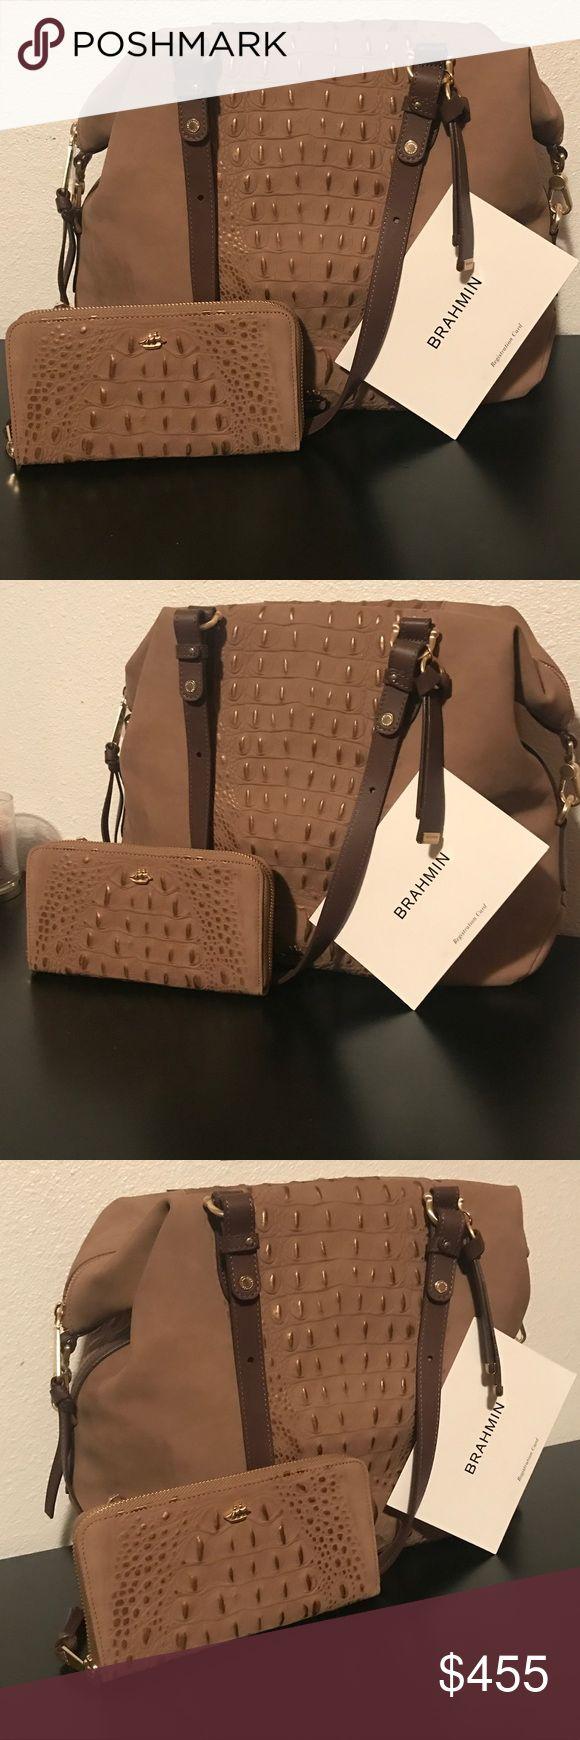 Final Price🍂Brahmin🍂 Brahmin Wilmington Collection   Handbag: •Delaney Satchel •Leather •Zip Closure •Back Slide-In Pocket Outside •Zip pocket,Pen Pocket and Key Clip Inside •Additional Removable Strap •4(H) x 11.75 (L) x 10.75 (D)  Wallet: •Leather •Zip Around Closure •Id Slot, 12 Credit Card Slots, and 2 Slide In Pockets for Cash/Checks •Zip Coin Pocket Outside •7.5 (W) x 4.25 (H) x 1 (D) Brahmin Bags Satchels